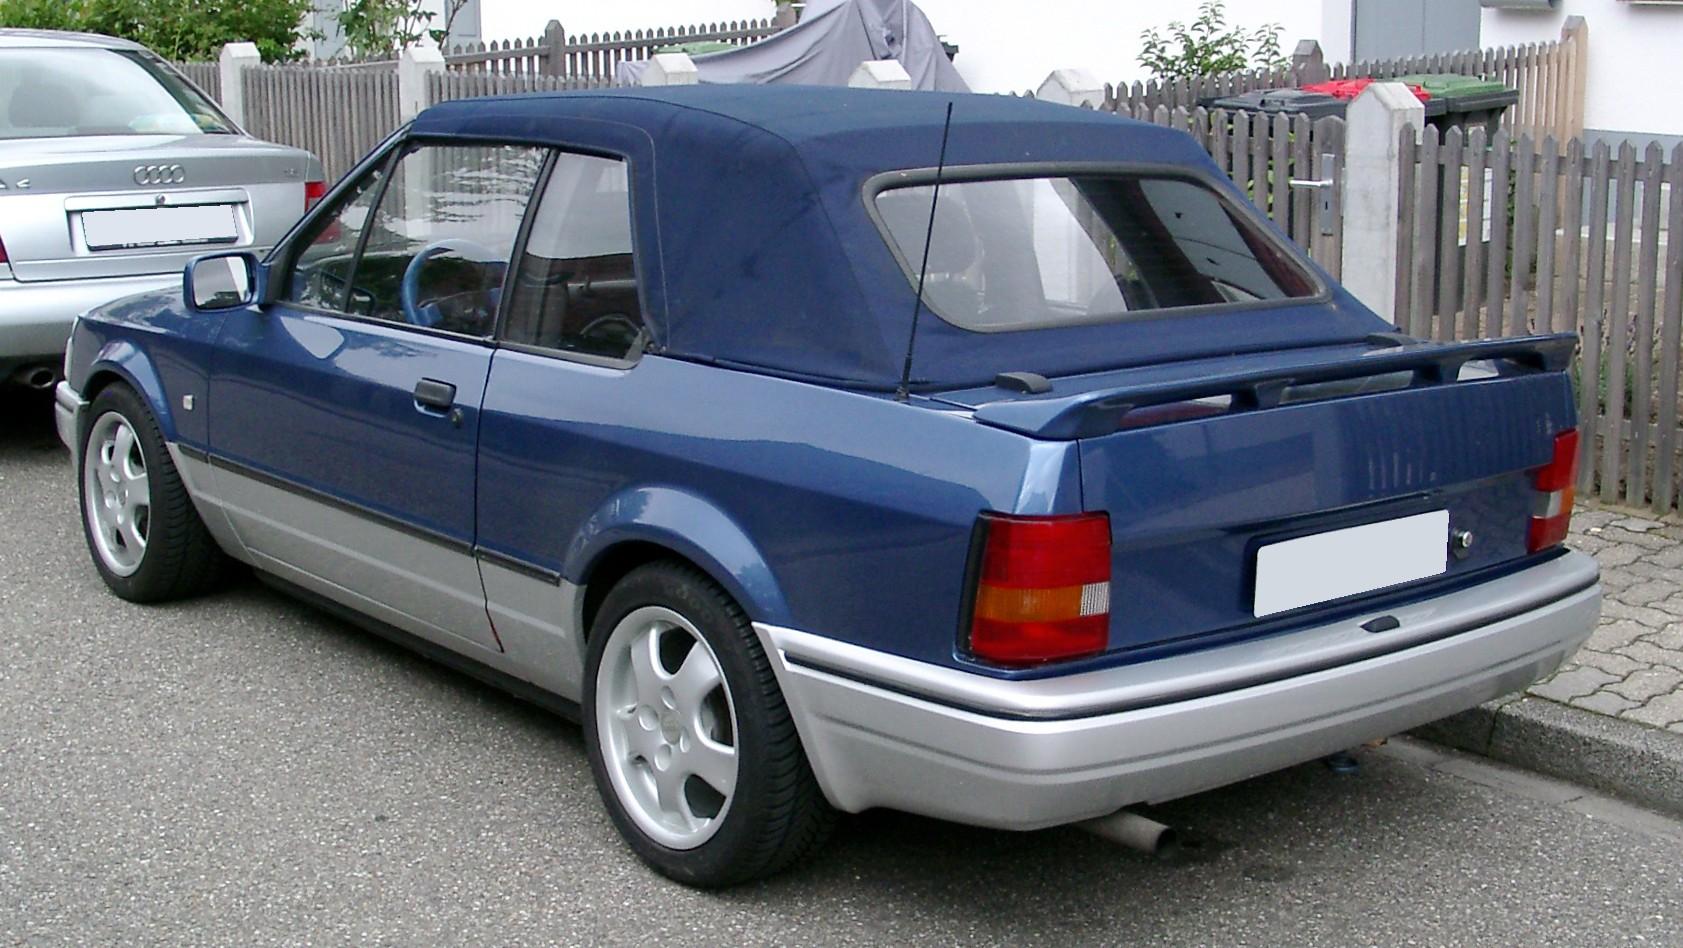 file ford escort cabriolet rear wikimedia. Black Bedroom Furniture Sets. Home Design Ideas